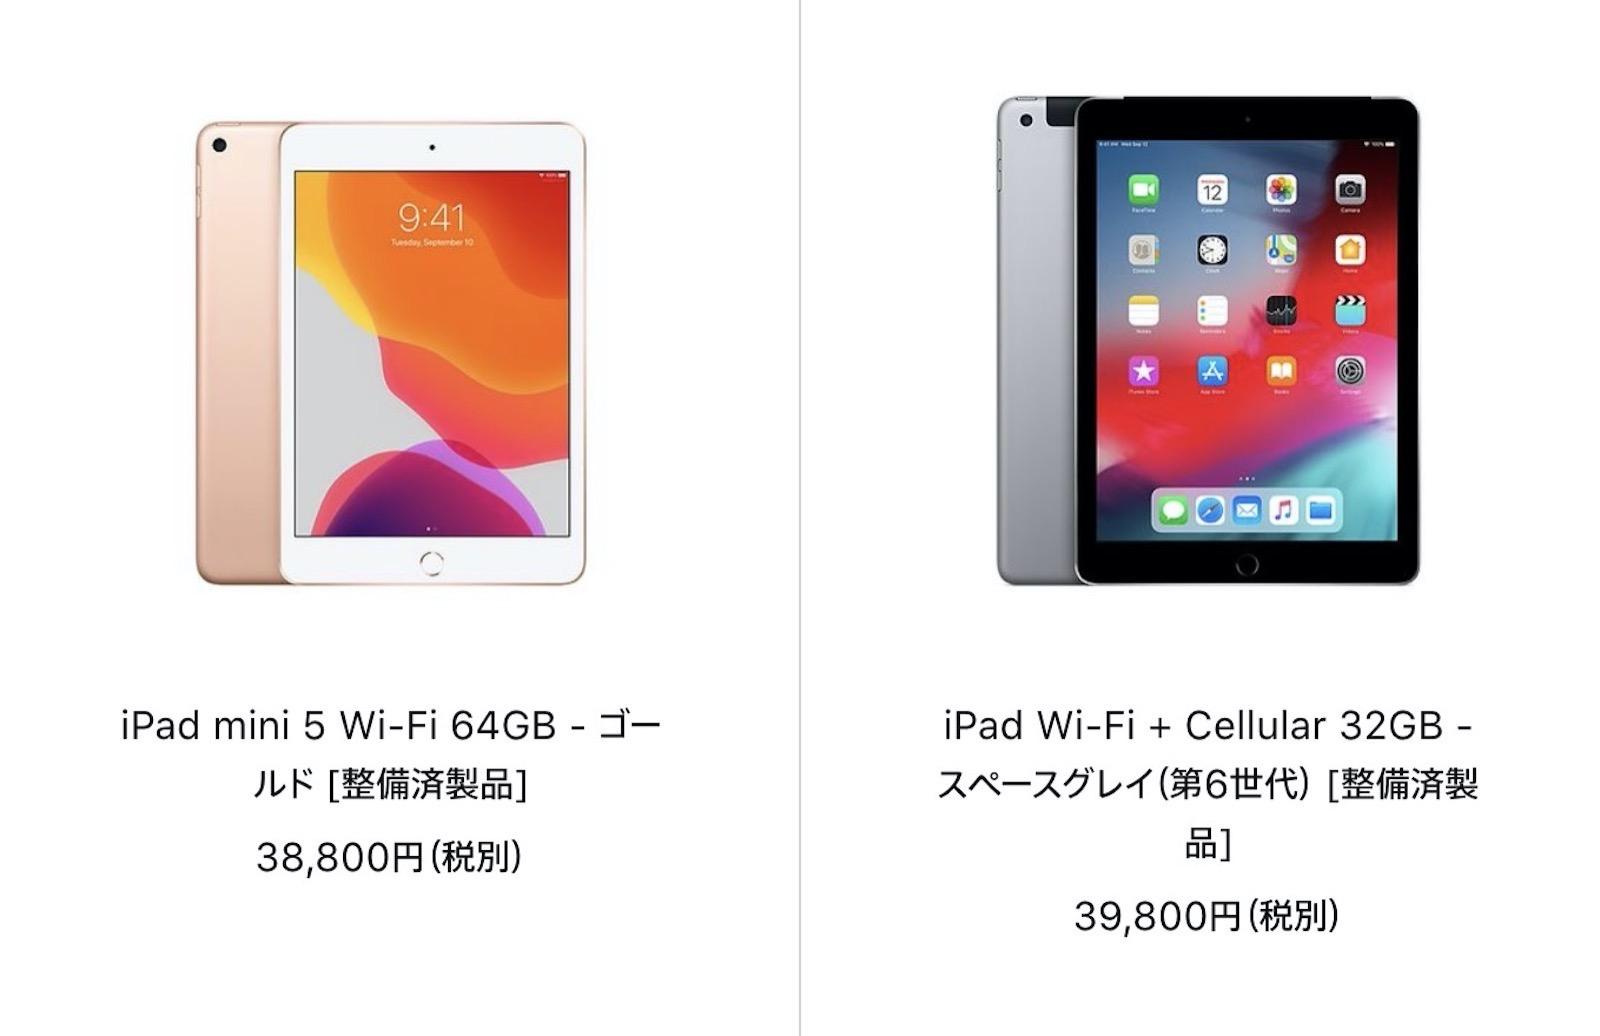 Ipad mini 5 and cellular model